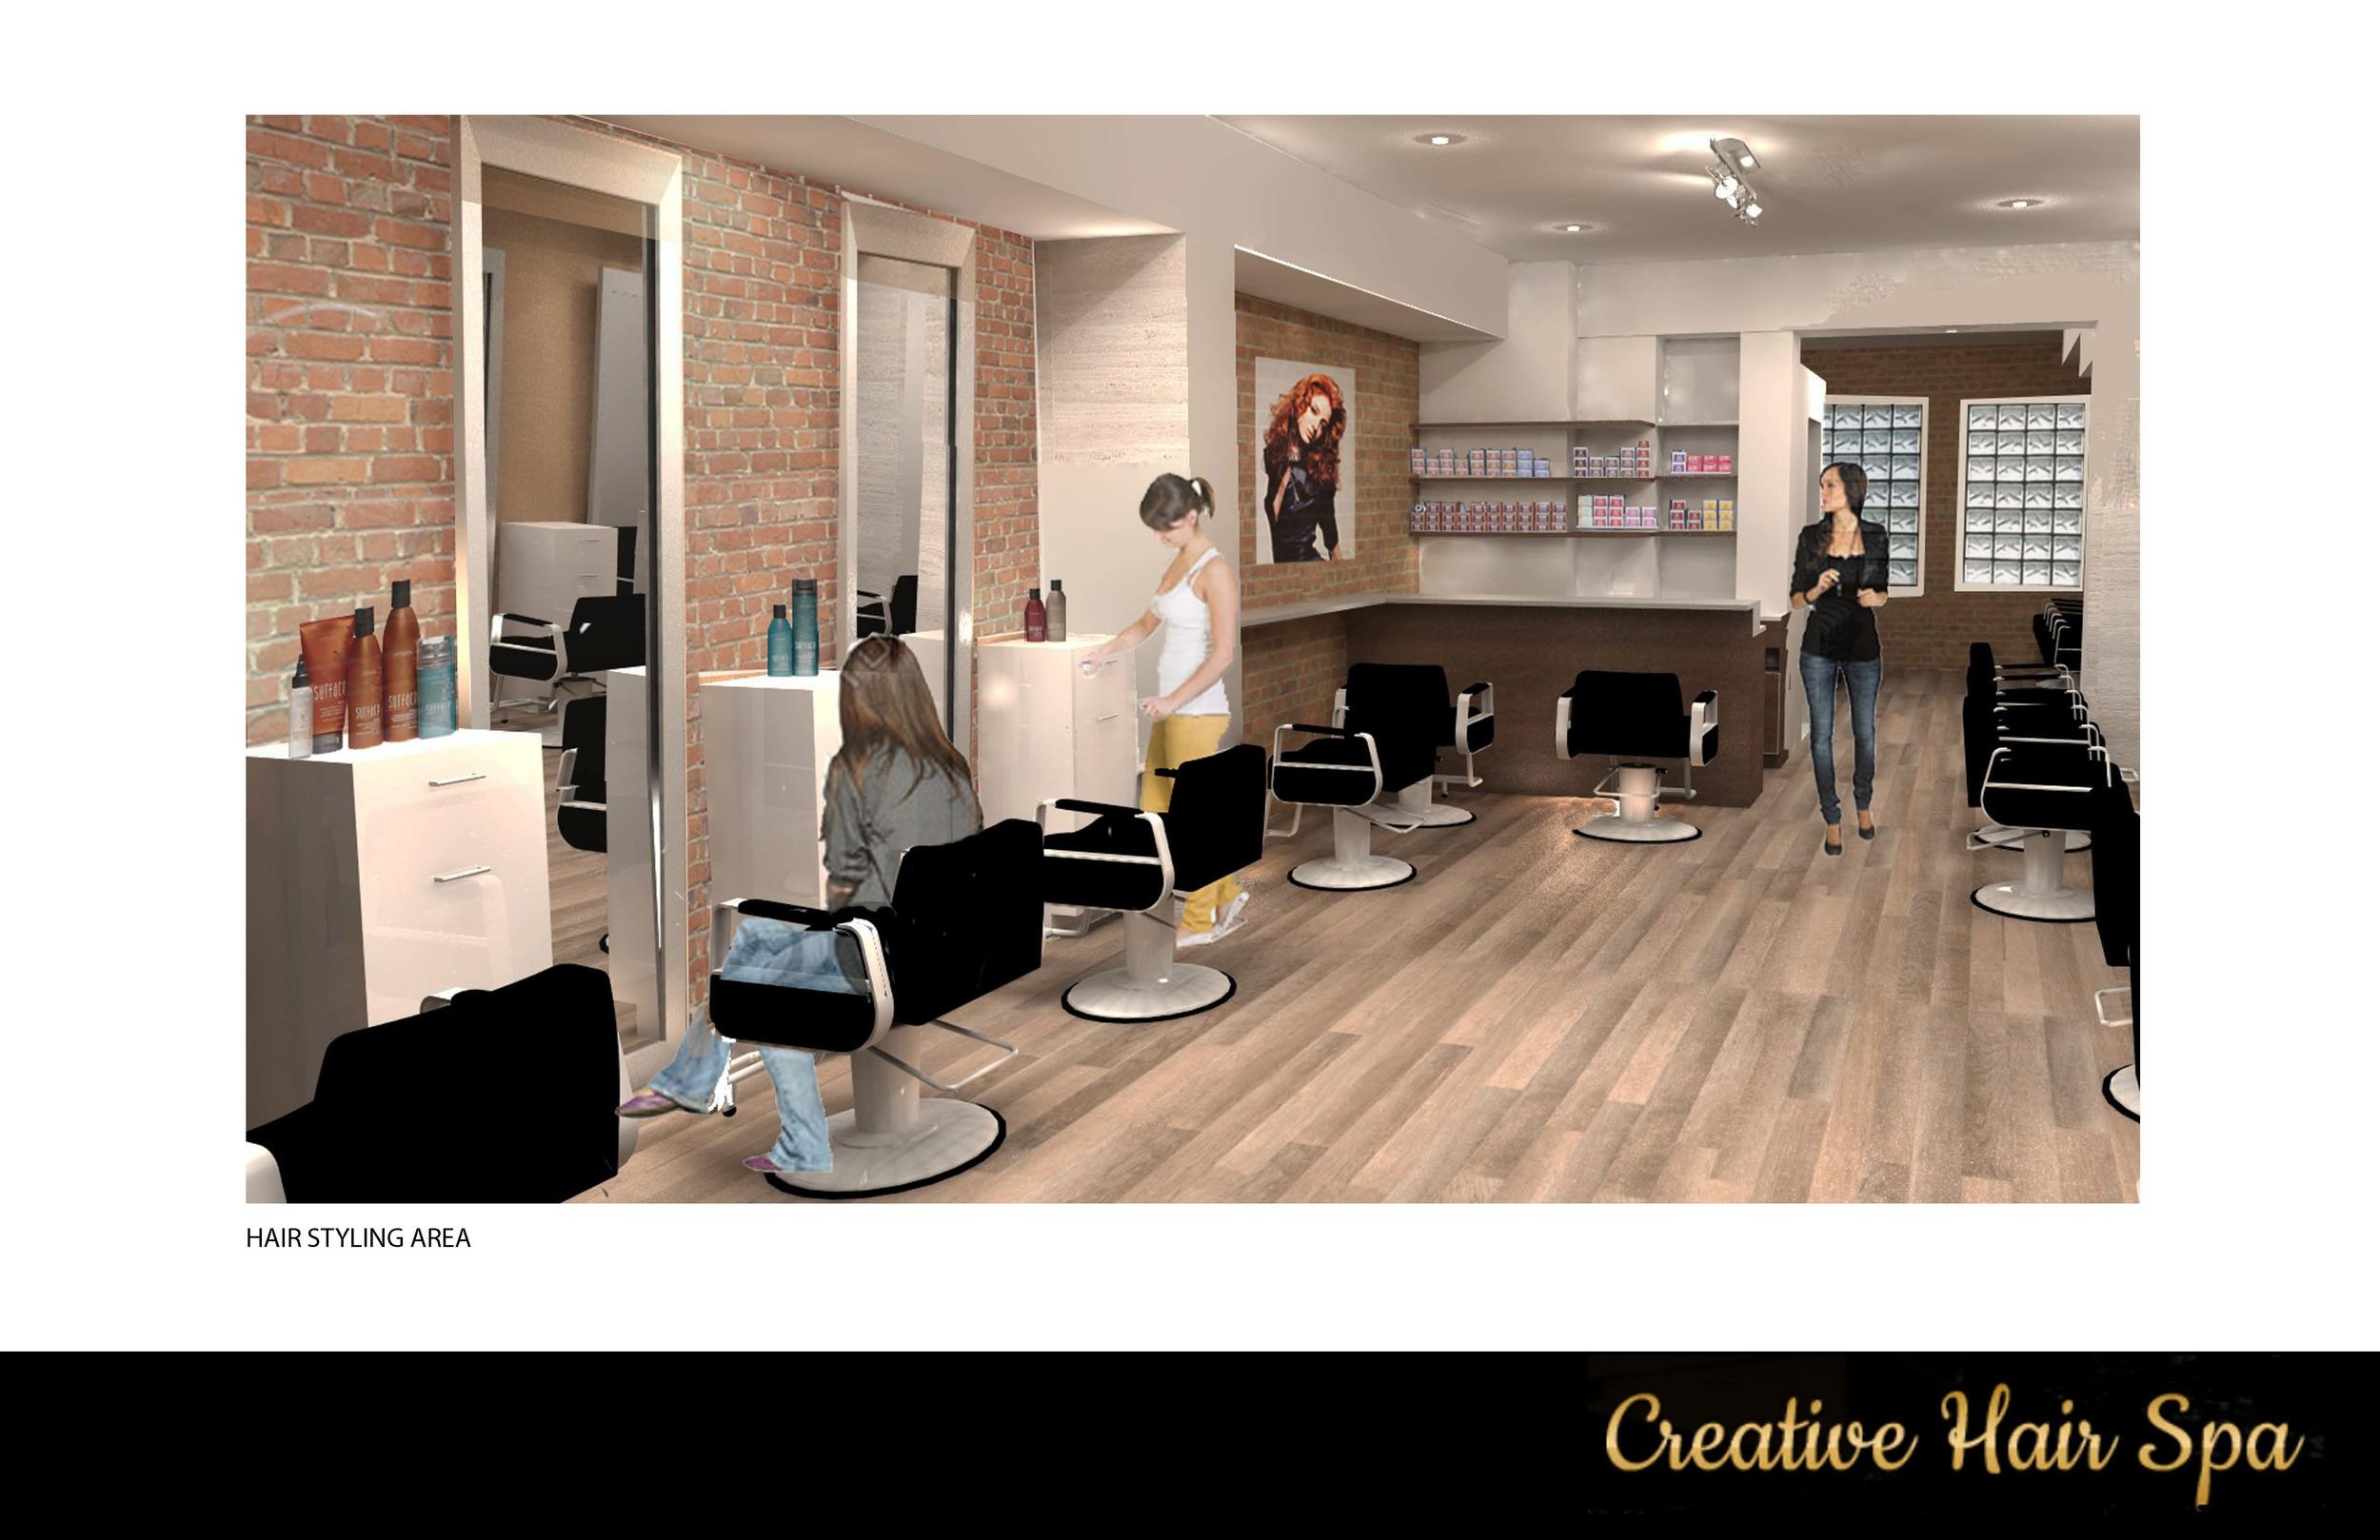 Creative Hair Spa Interior Design_Page_4.jpg